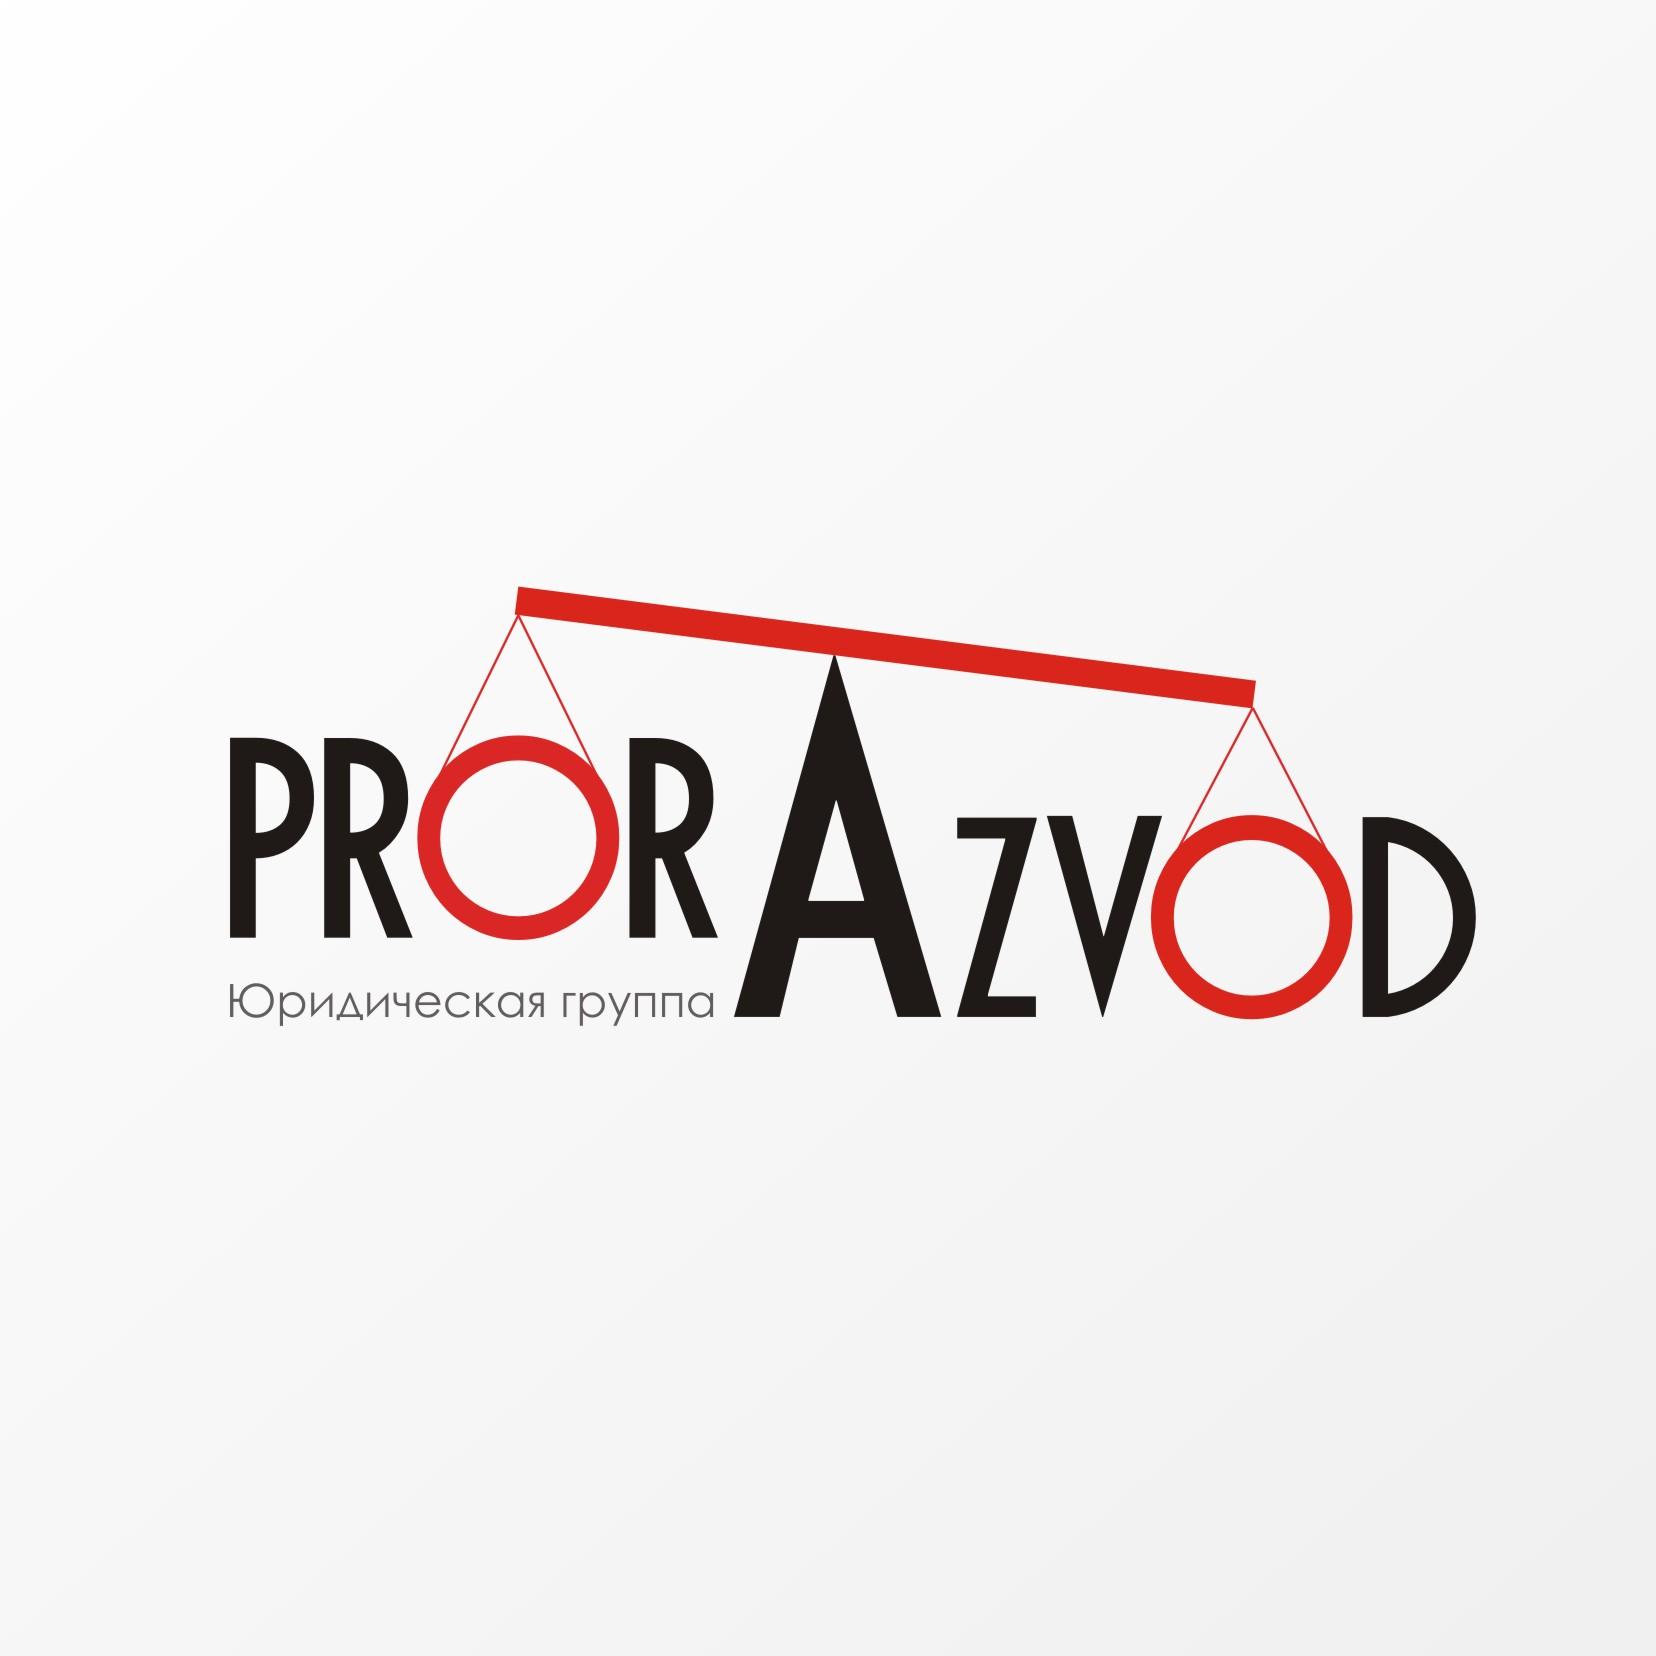 Логотип и фирм стиль для бракоразводного агенства. фото f_2885876976f6d264.jpg